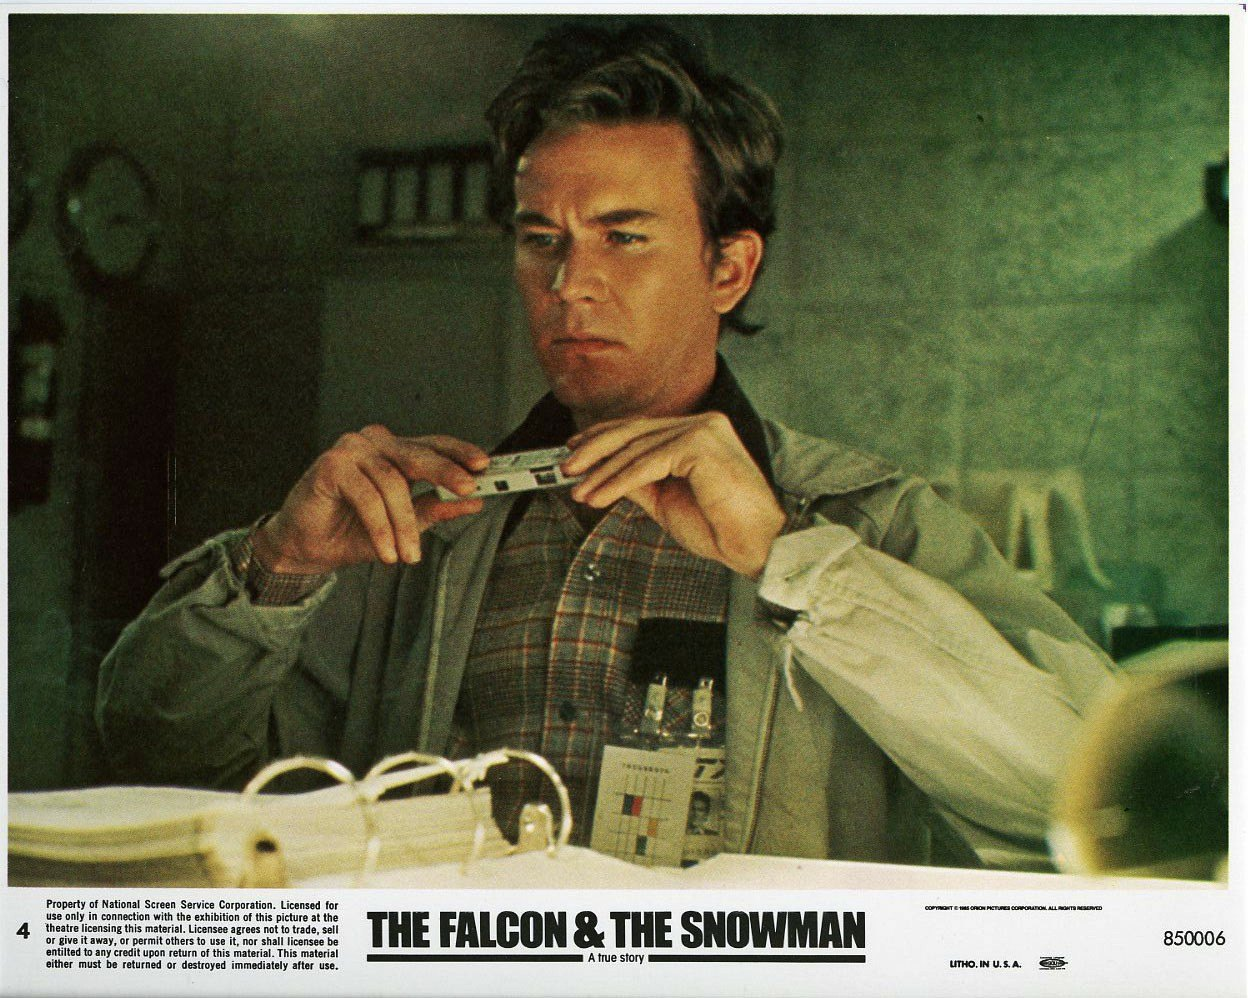 penn falcon and snowman 20 Things You Didn't Know About Sean Penn